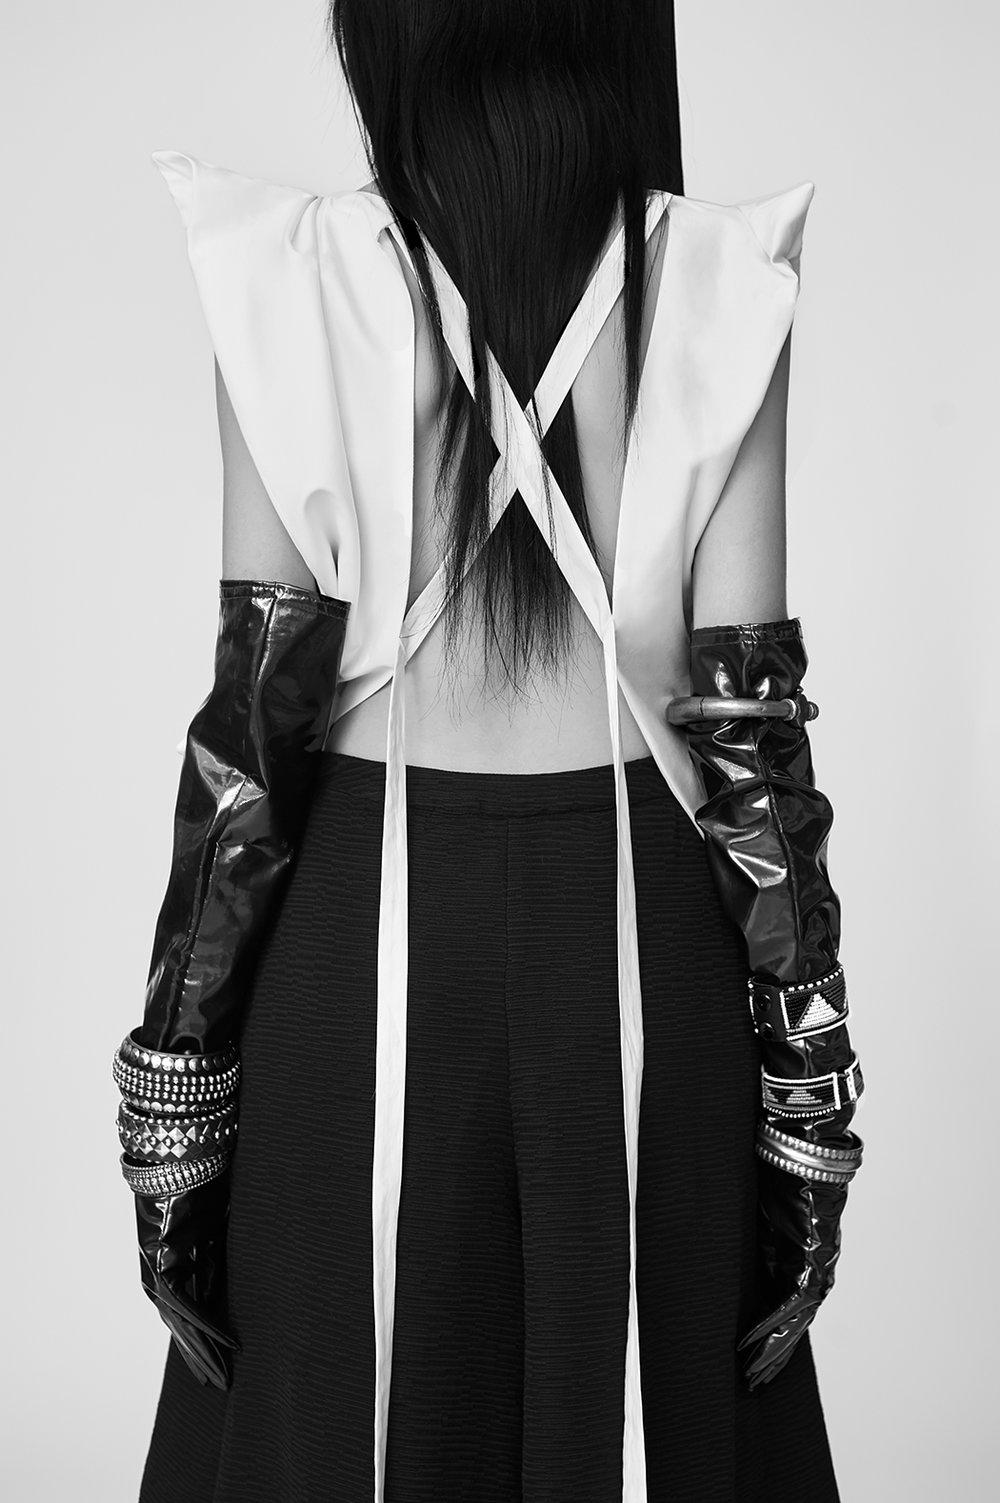 Top by Karin Kate Wong, BFA Fashion Design. Culotte by Jiaqi Lu, BFA Fashion Design. Vintage gloves. All jewelry, stylist's own.